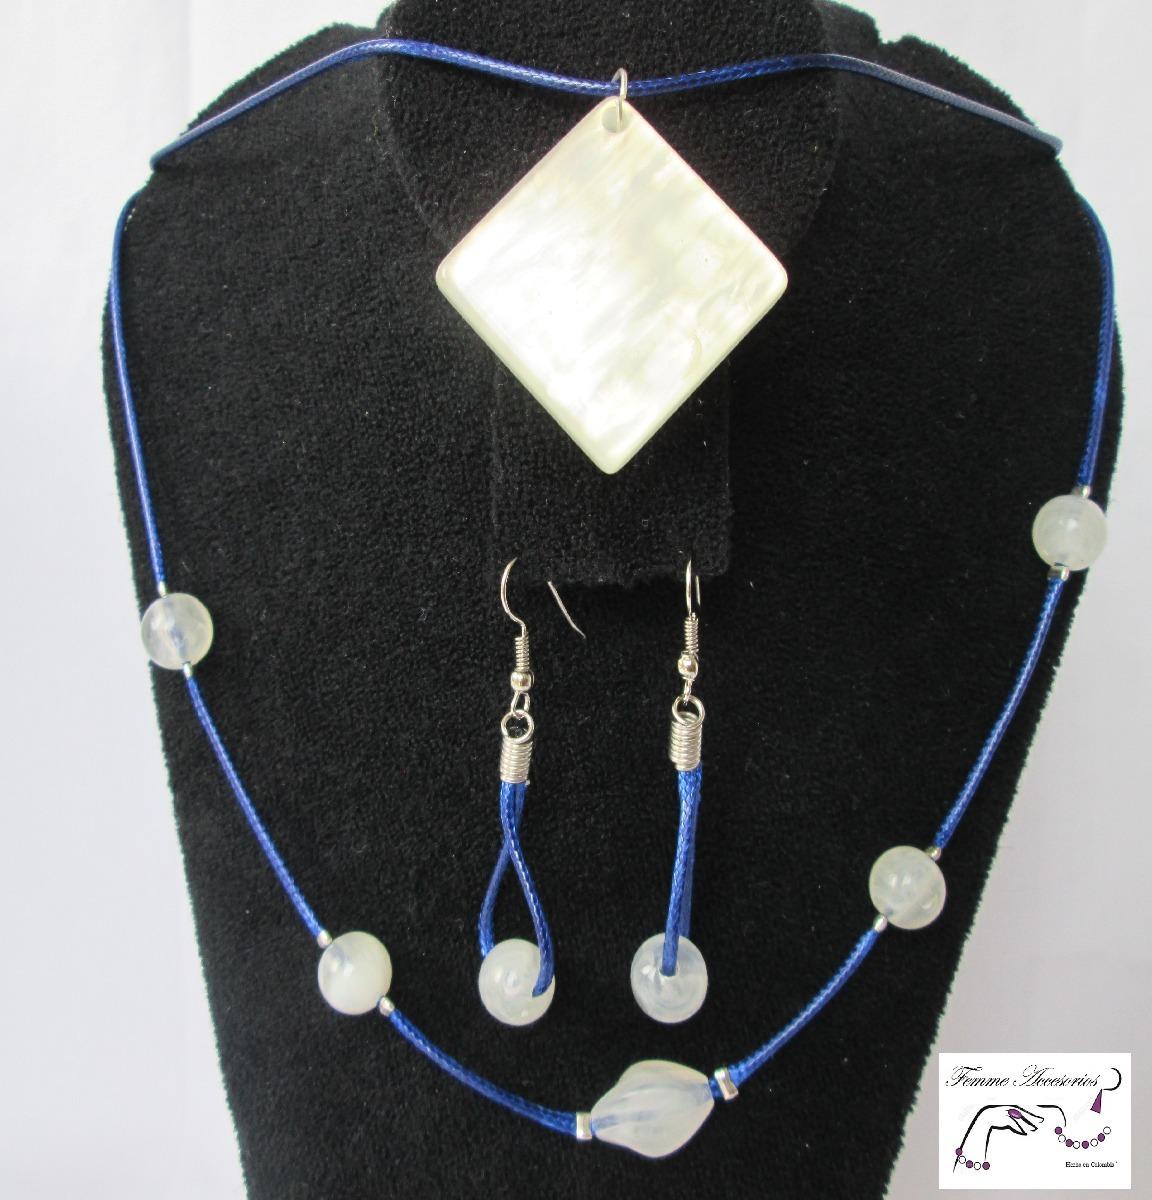 a9296f3bbdd8 Mujer Accesorios Joyería Bisutería Collar Azul C-058.1 -   23.000 en ...